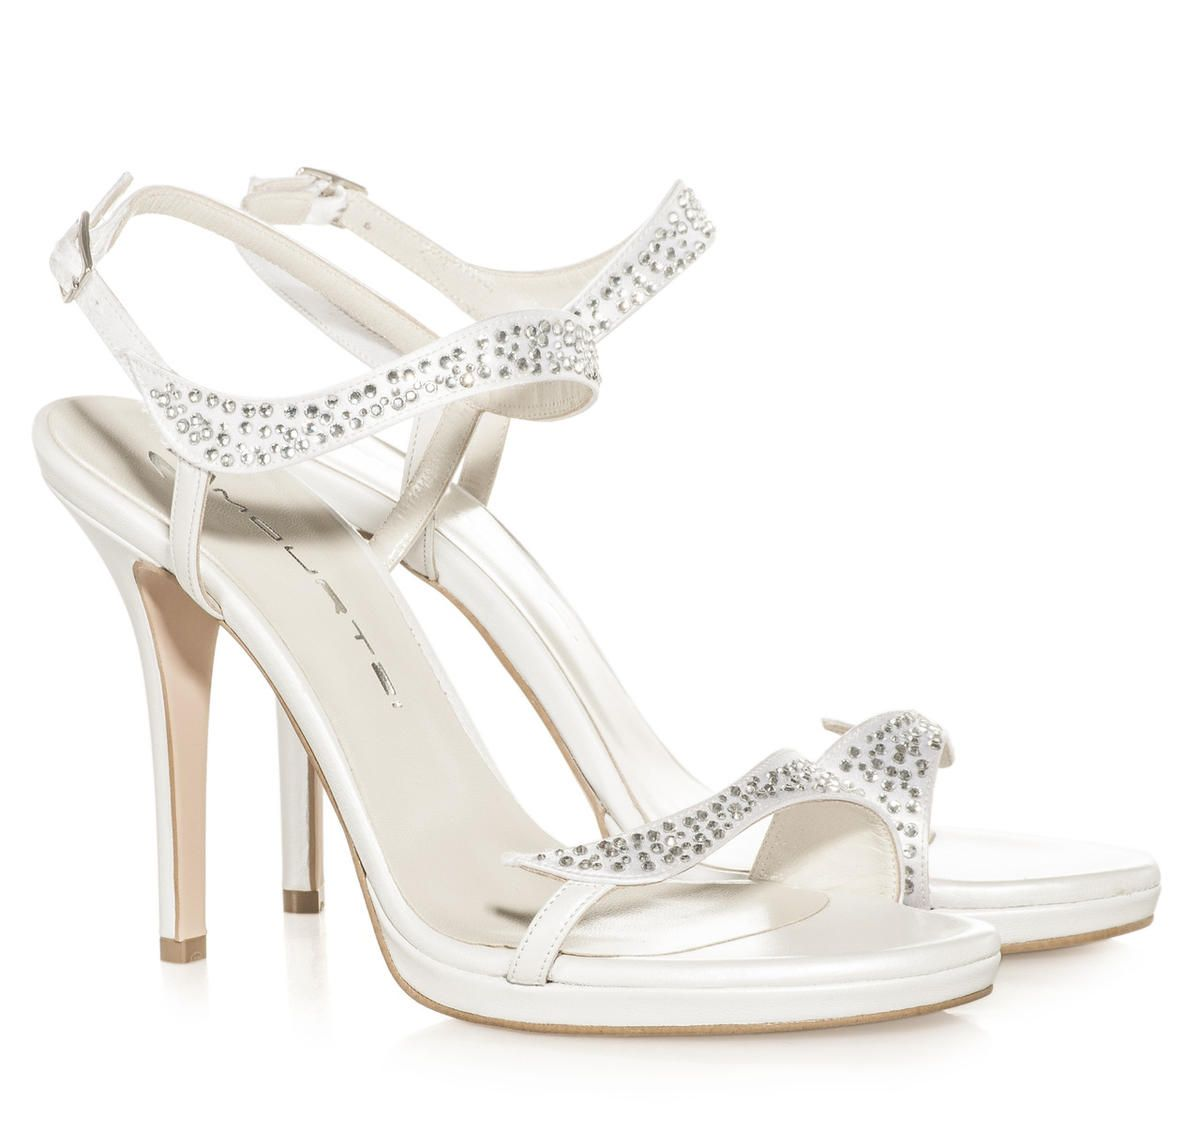 526a8406a1f ΝΥΦΙΚΑ ΠΕΔΙΛΑ ΜΕ STRASS MOURTZI | Perfect Bridal Shoes // Νυφικά ...